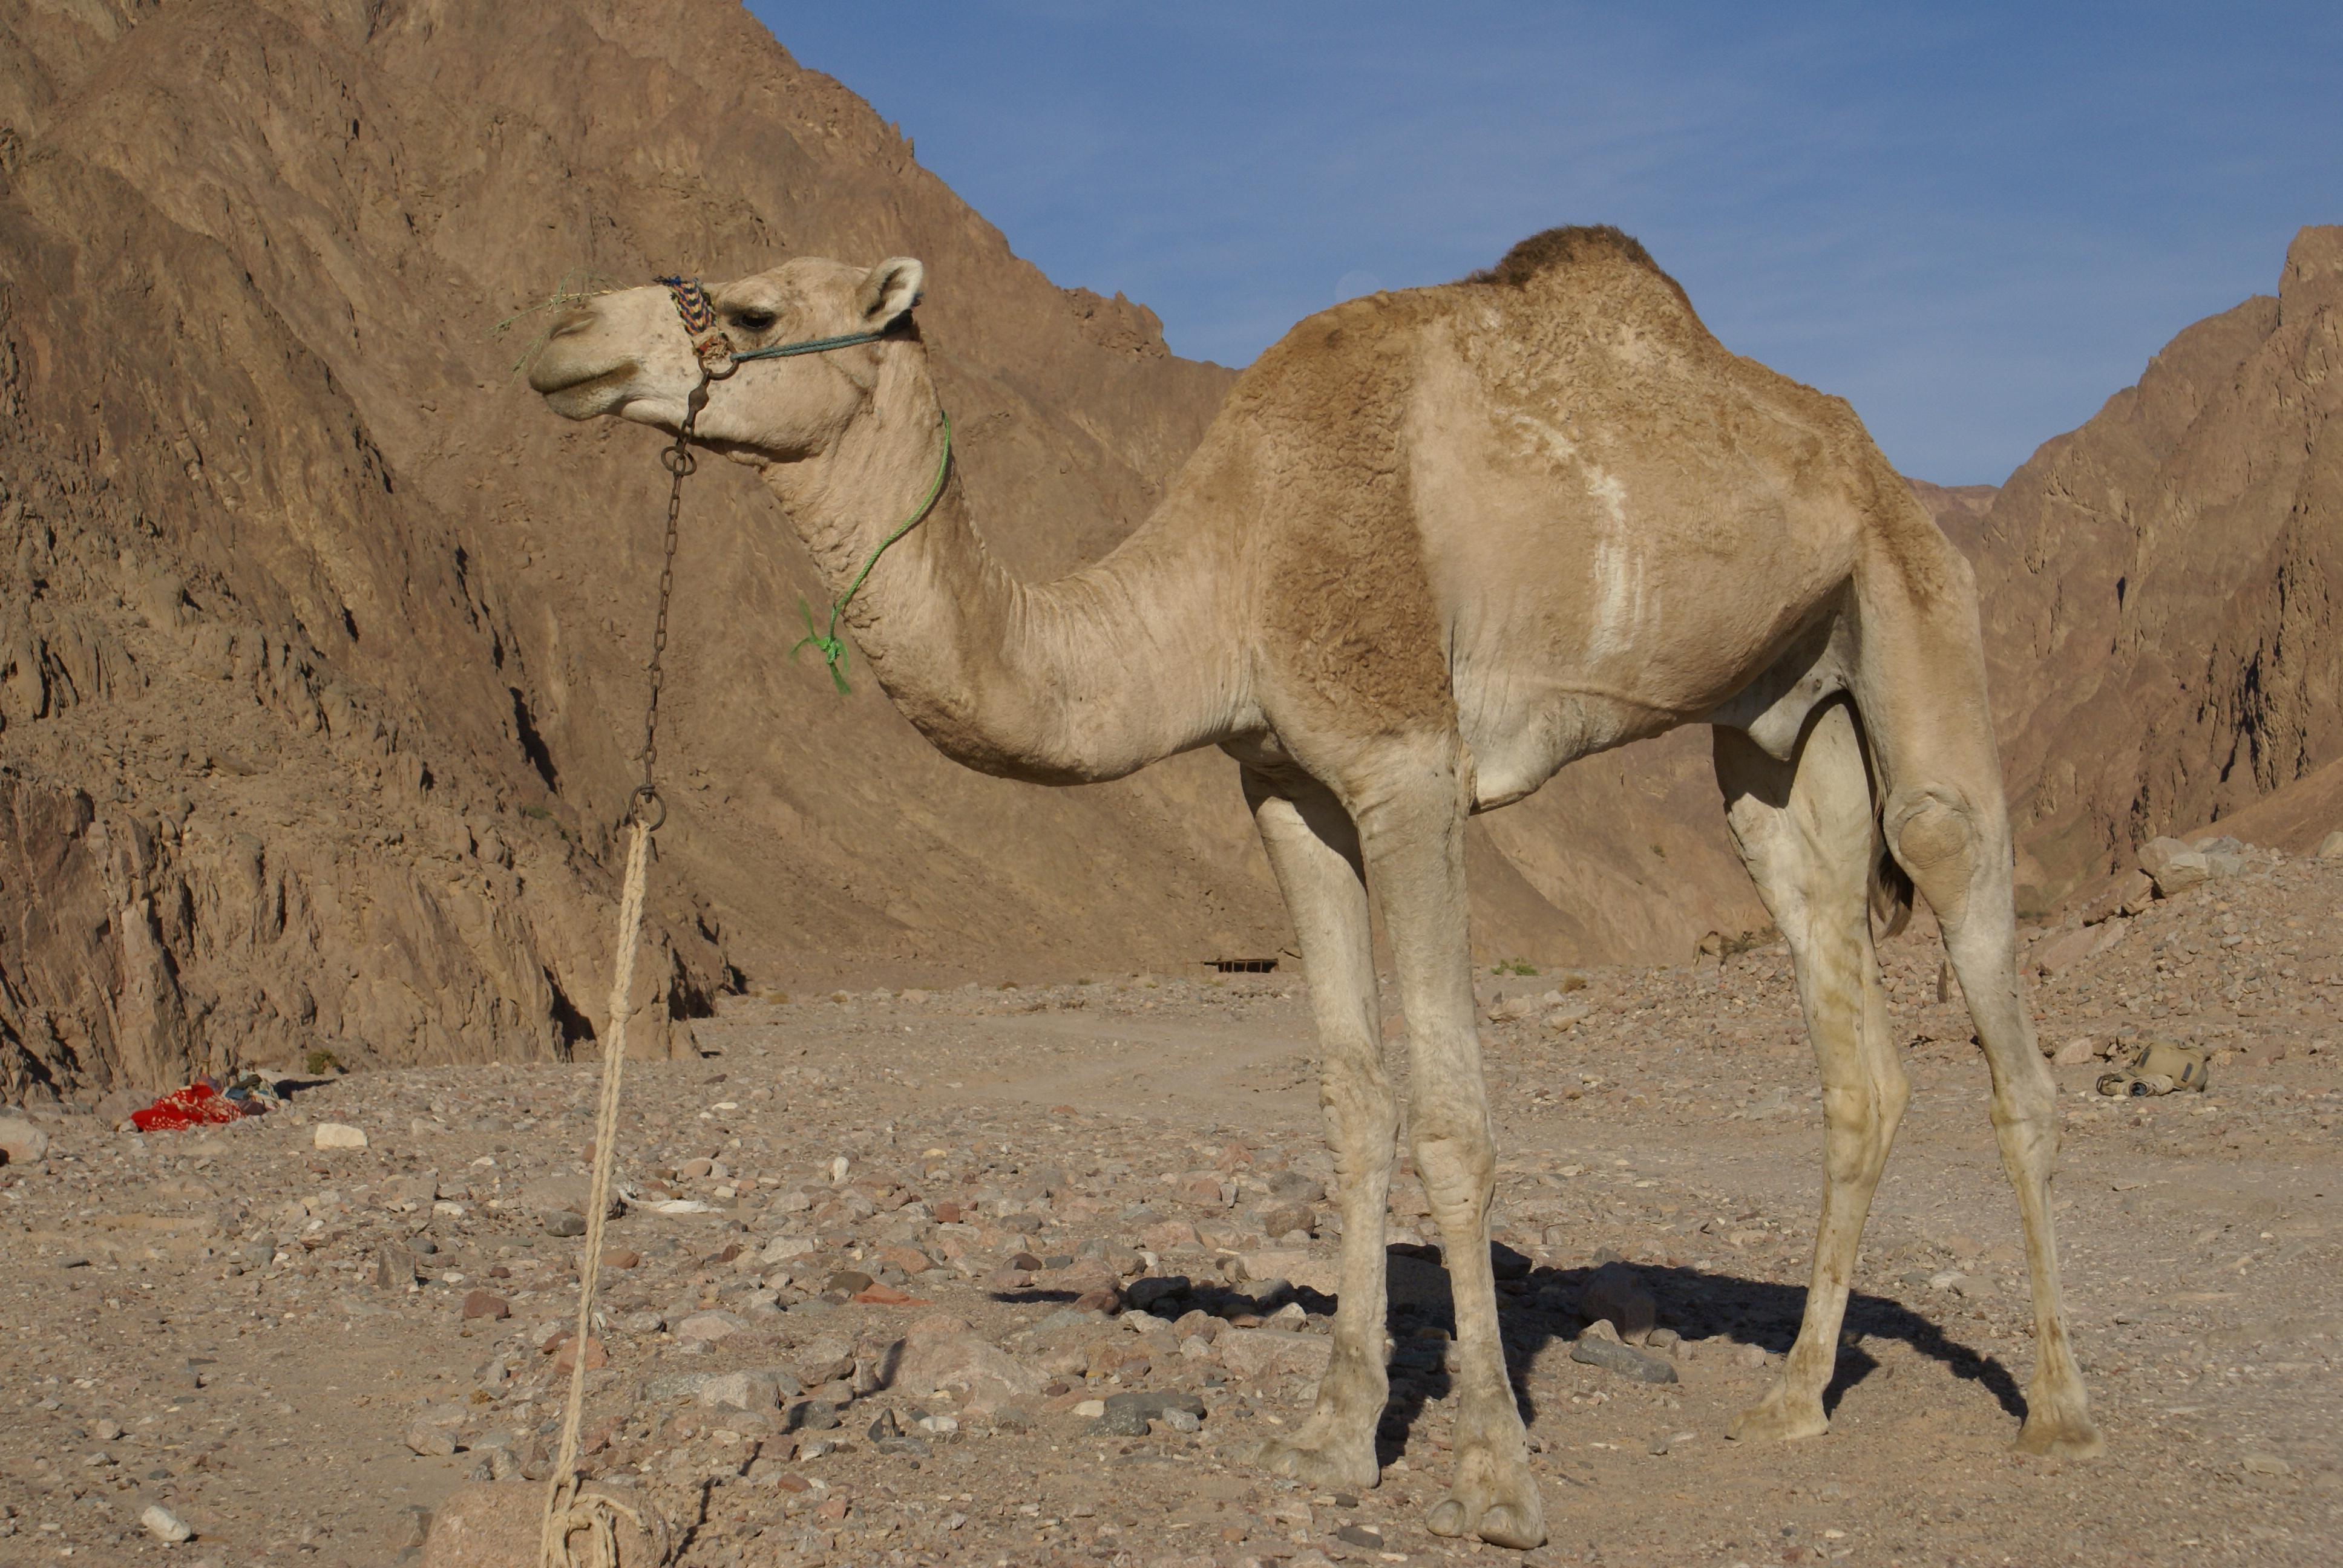 La historia del camello Canario